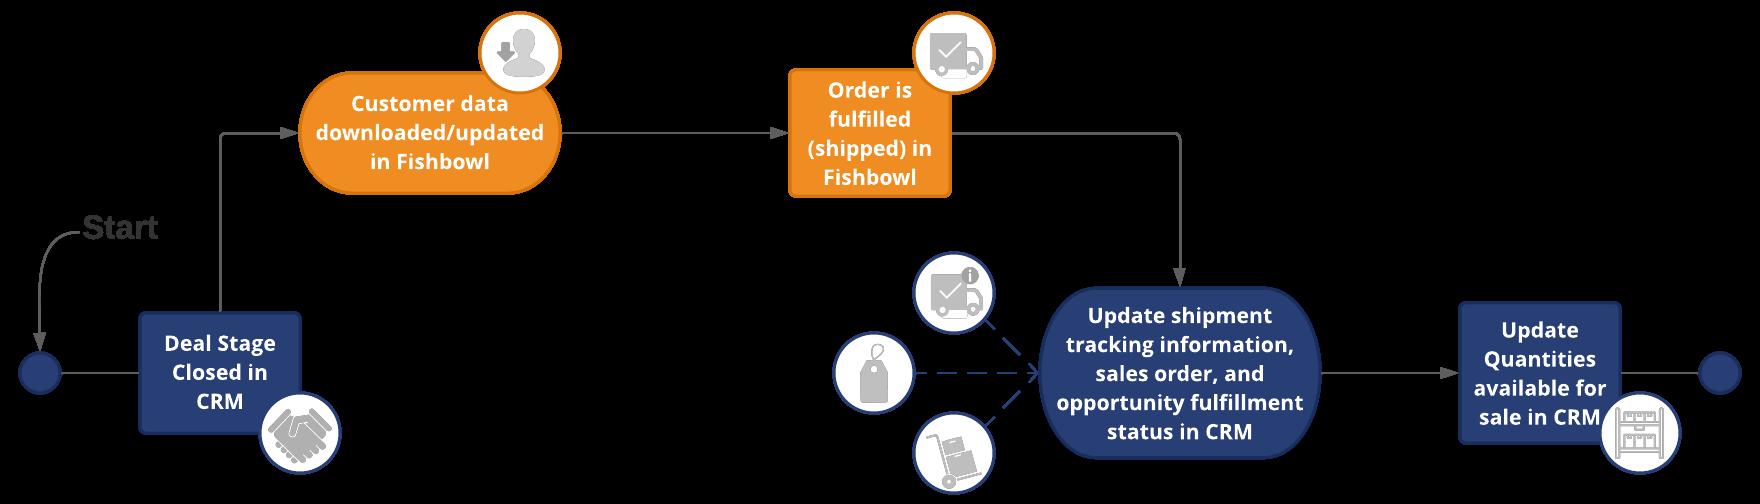 Fishbowl CRM Integration Flow